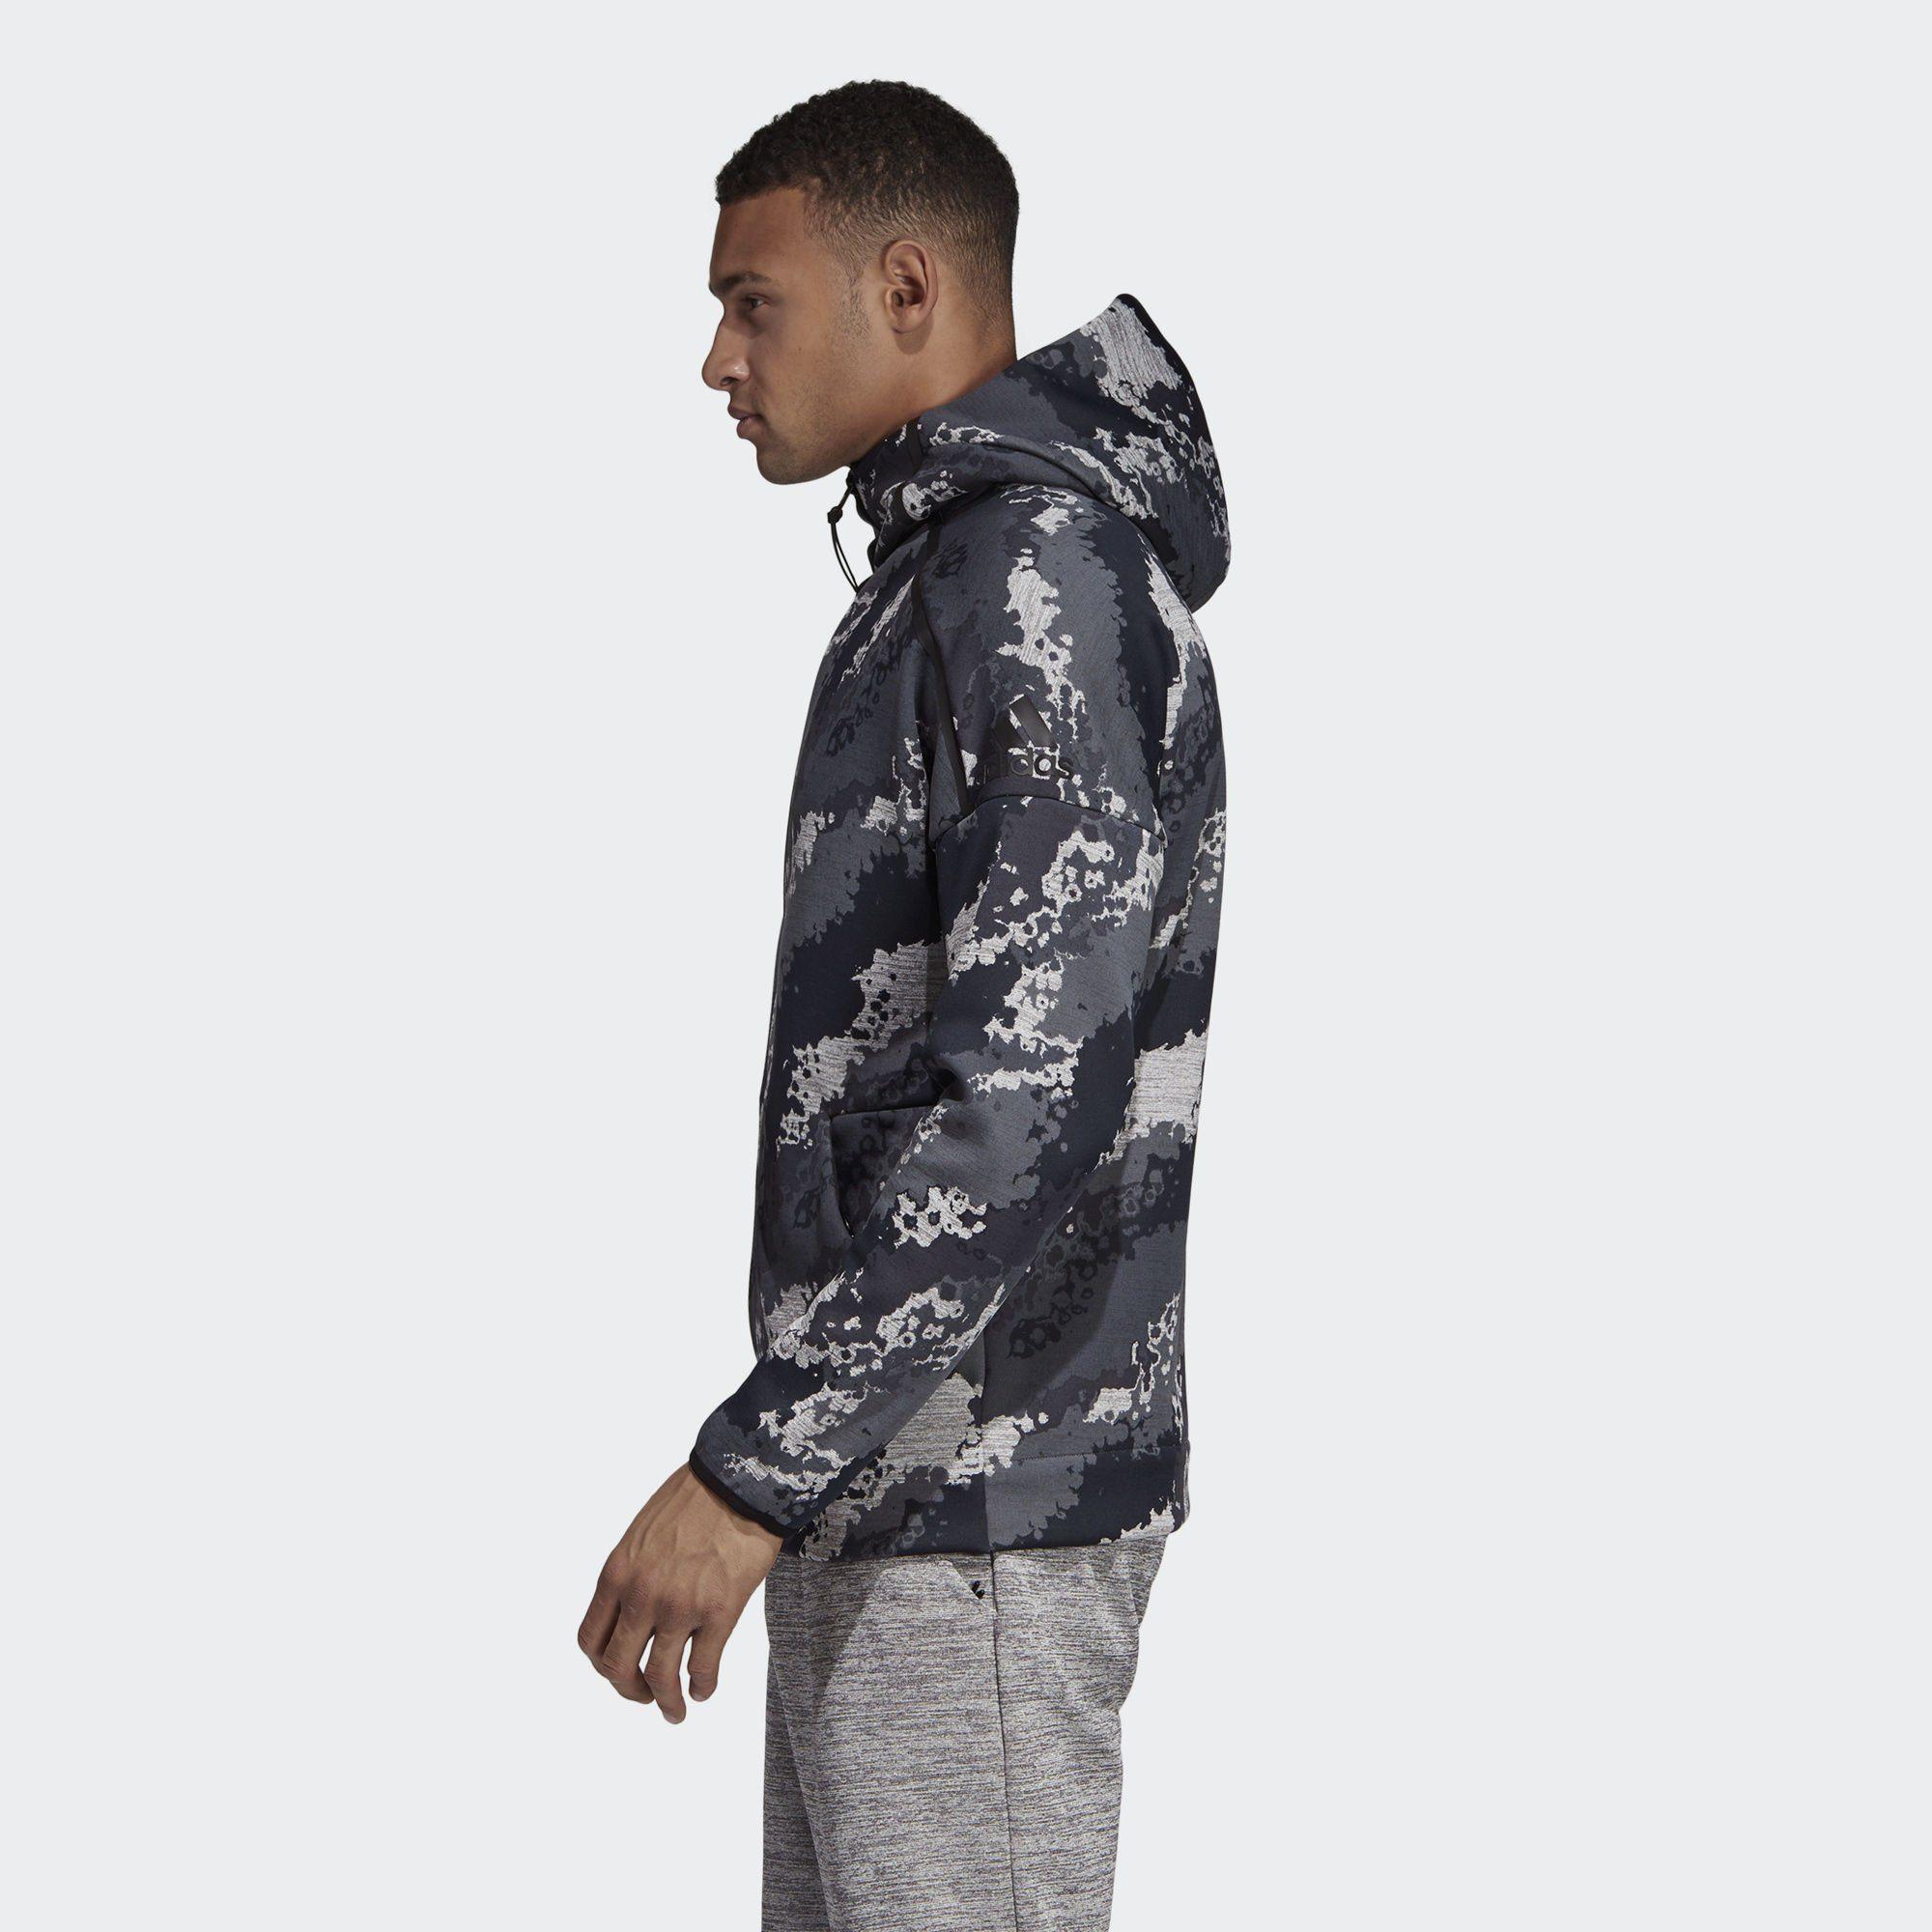 adidas Performance Sweatjacke »adidas Z.N.E. Allover Print Fast Release Hoodie« ZNE online kaufen   OTTO